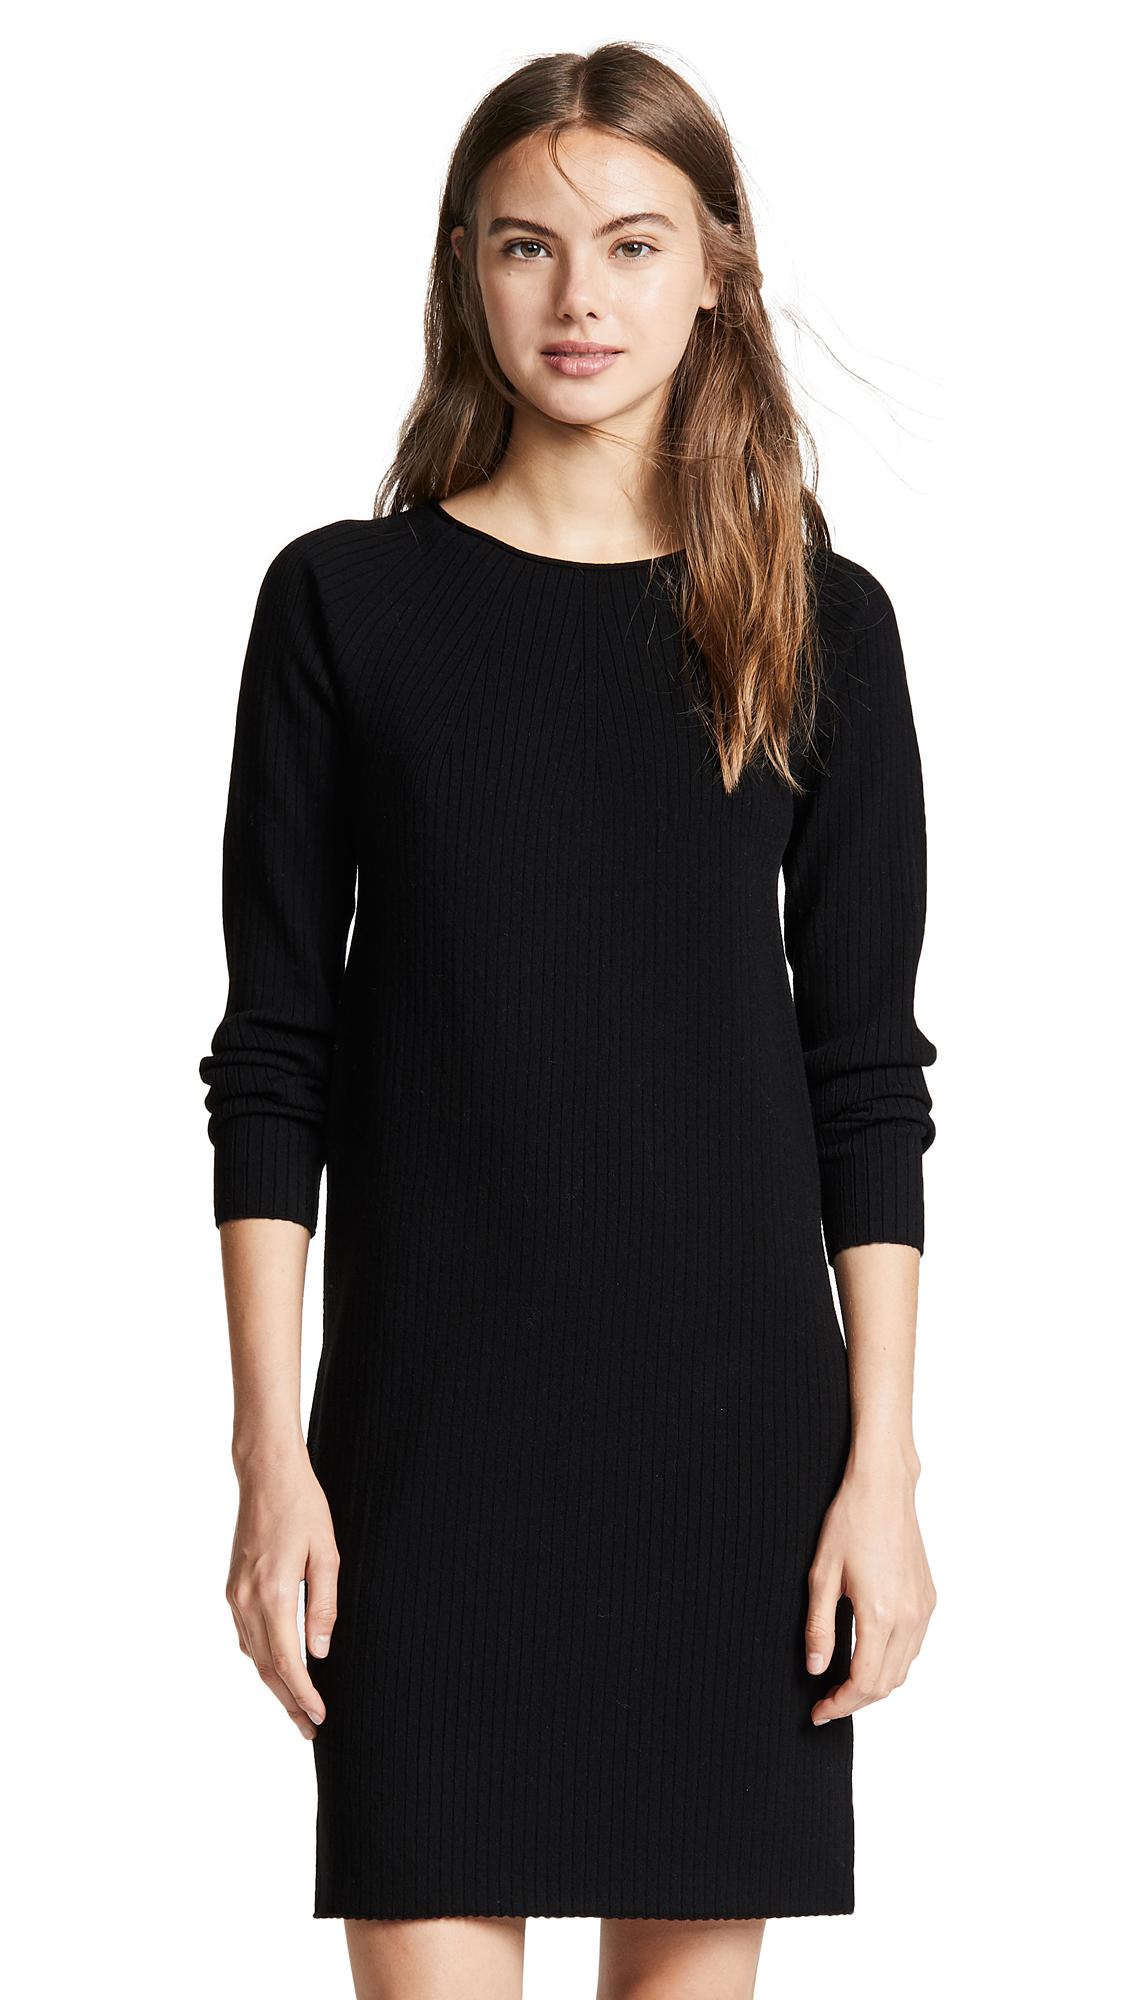 Vince Ribbed Dress In Black